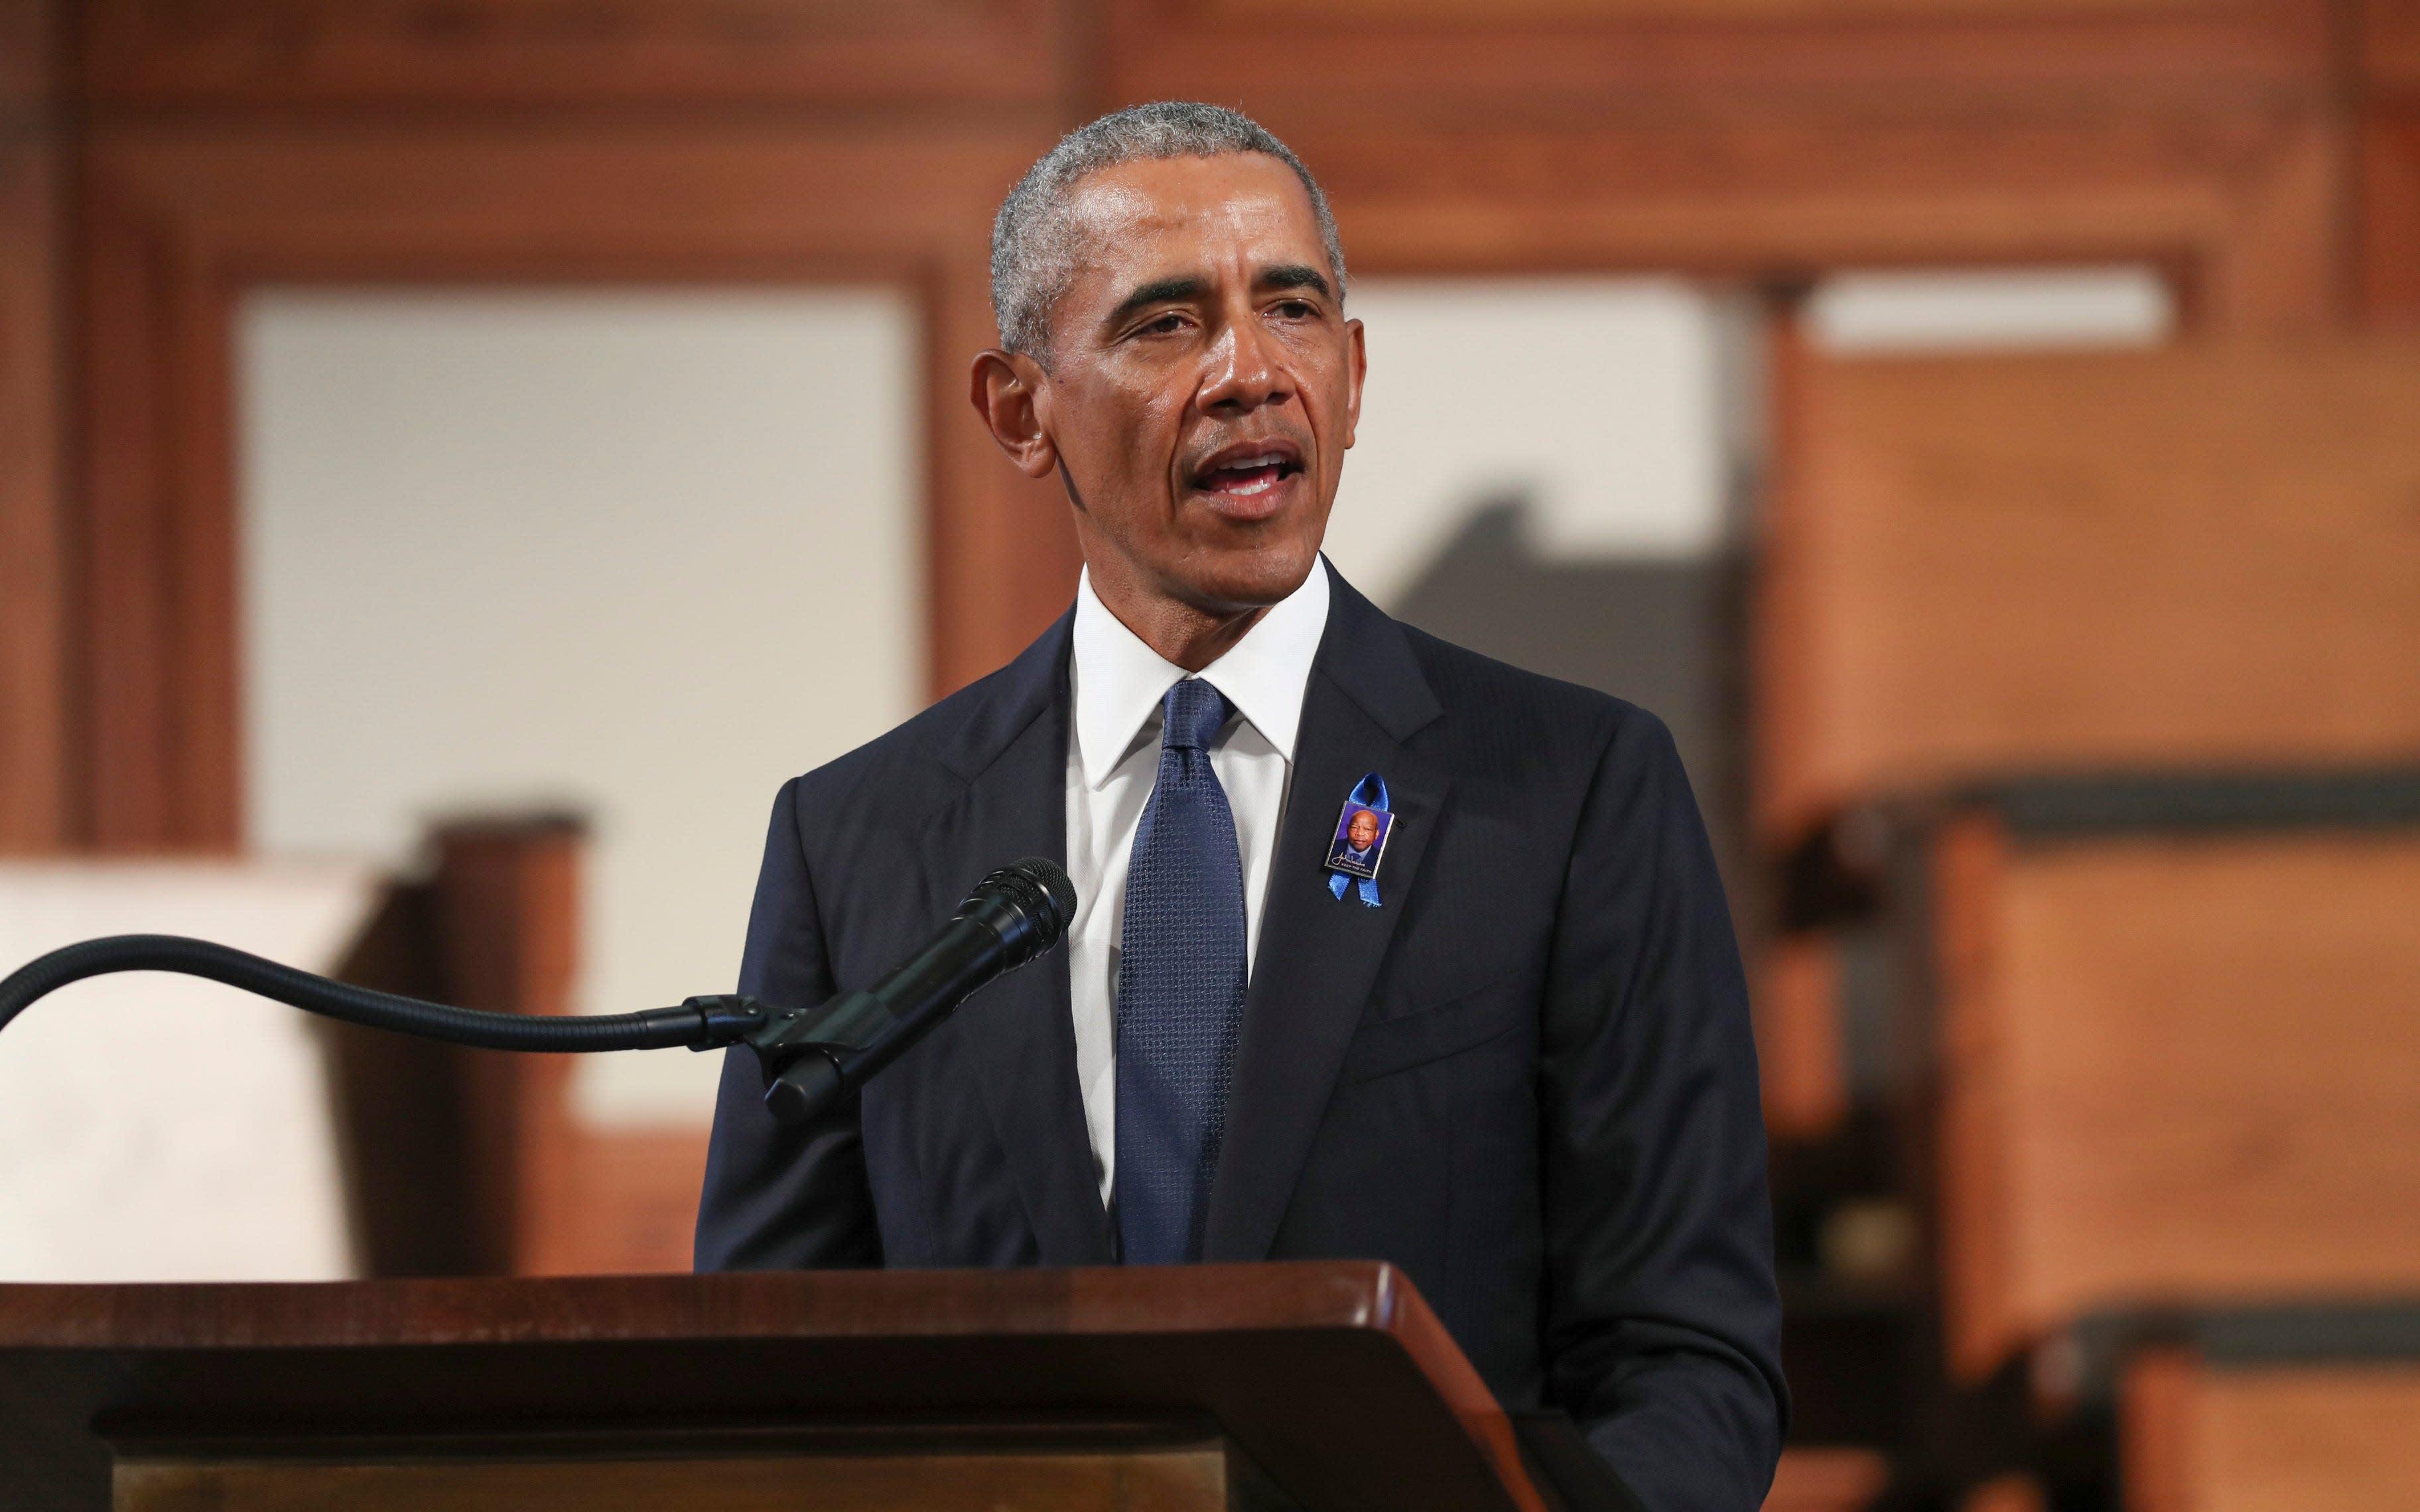 Former President Barack Obama delivers a rousing eulogy: 'America was built by John Lewises'